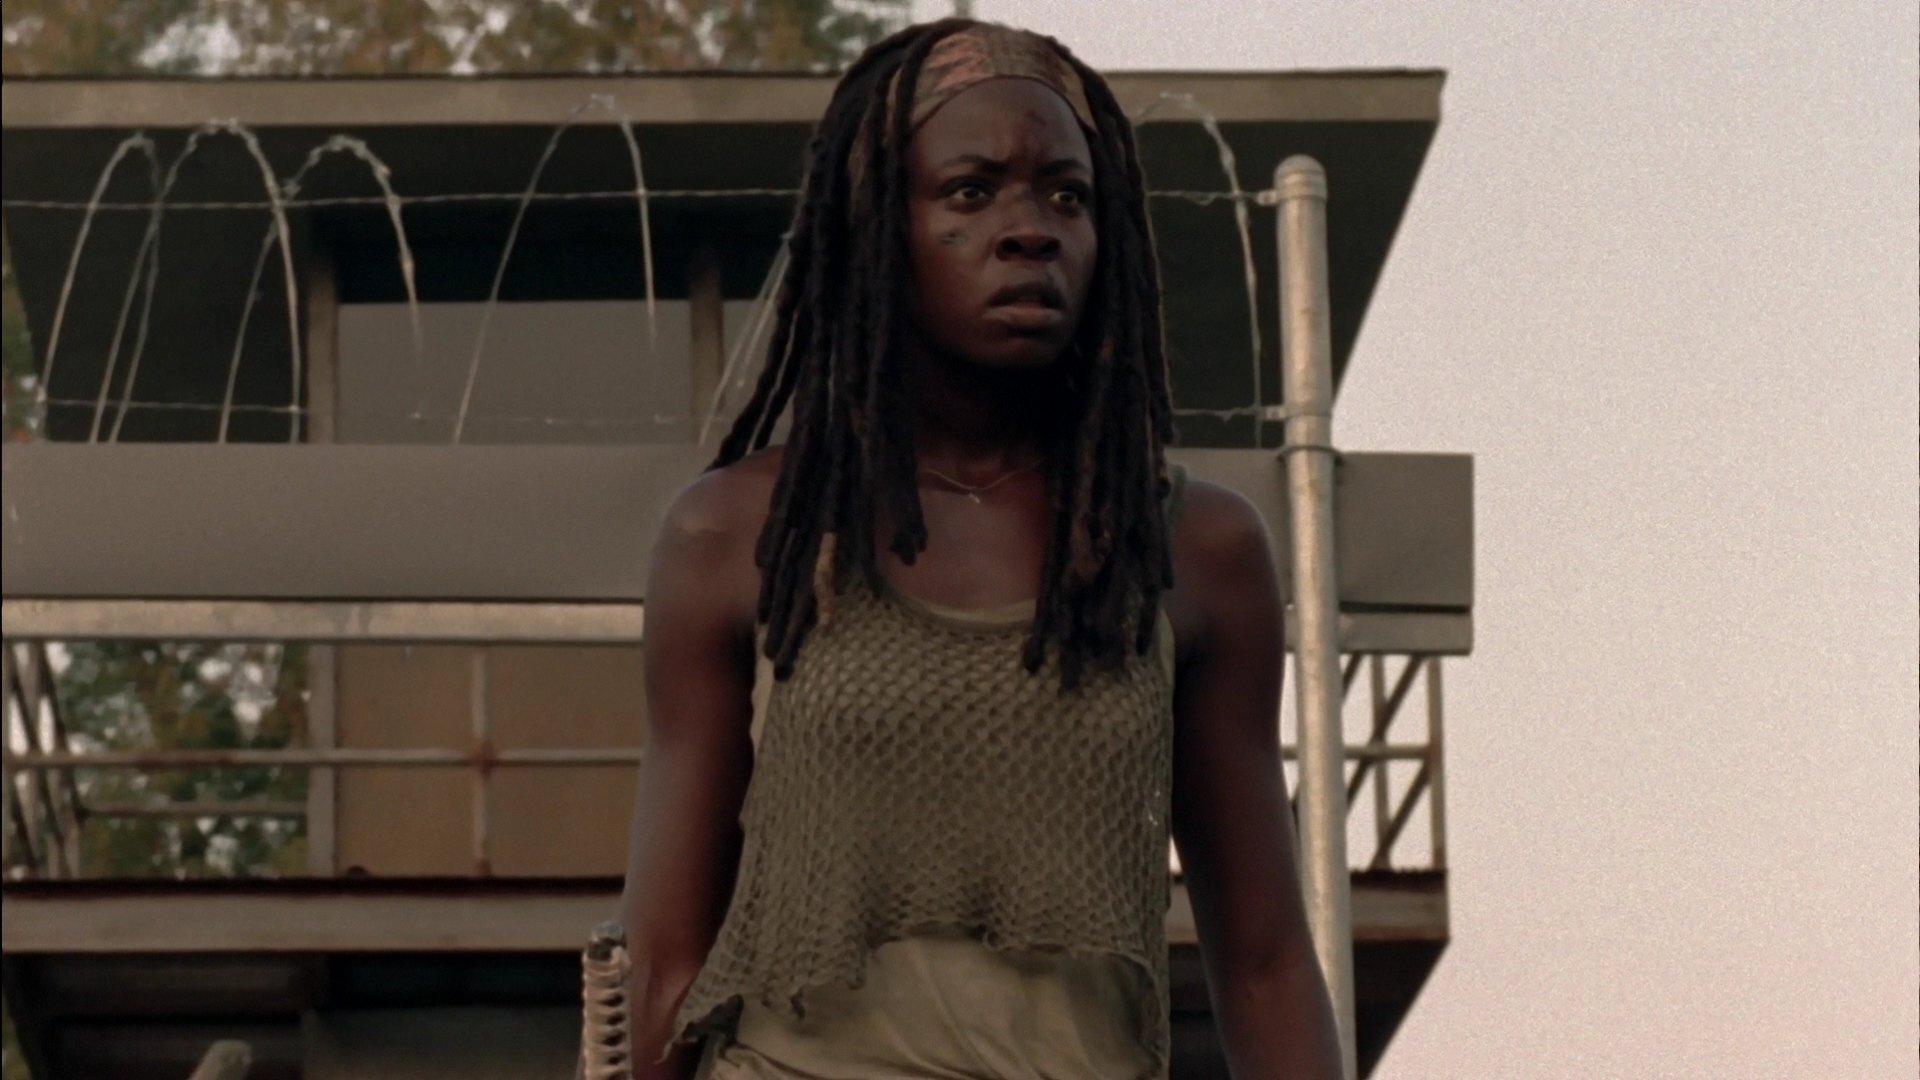 'The Walking Dead' Season 3 Episode 10 Captures